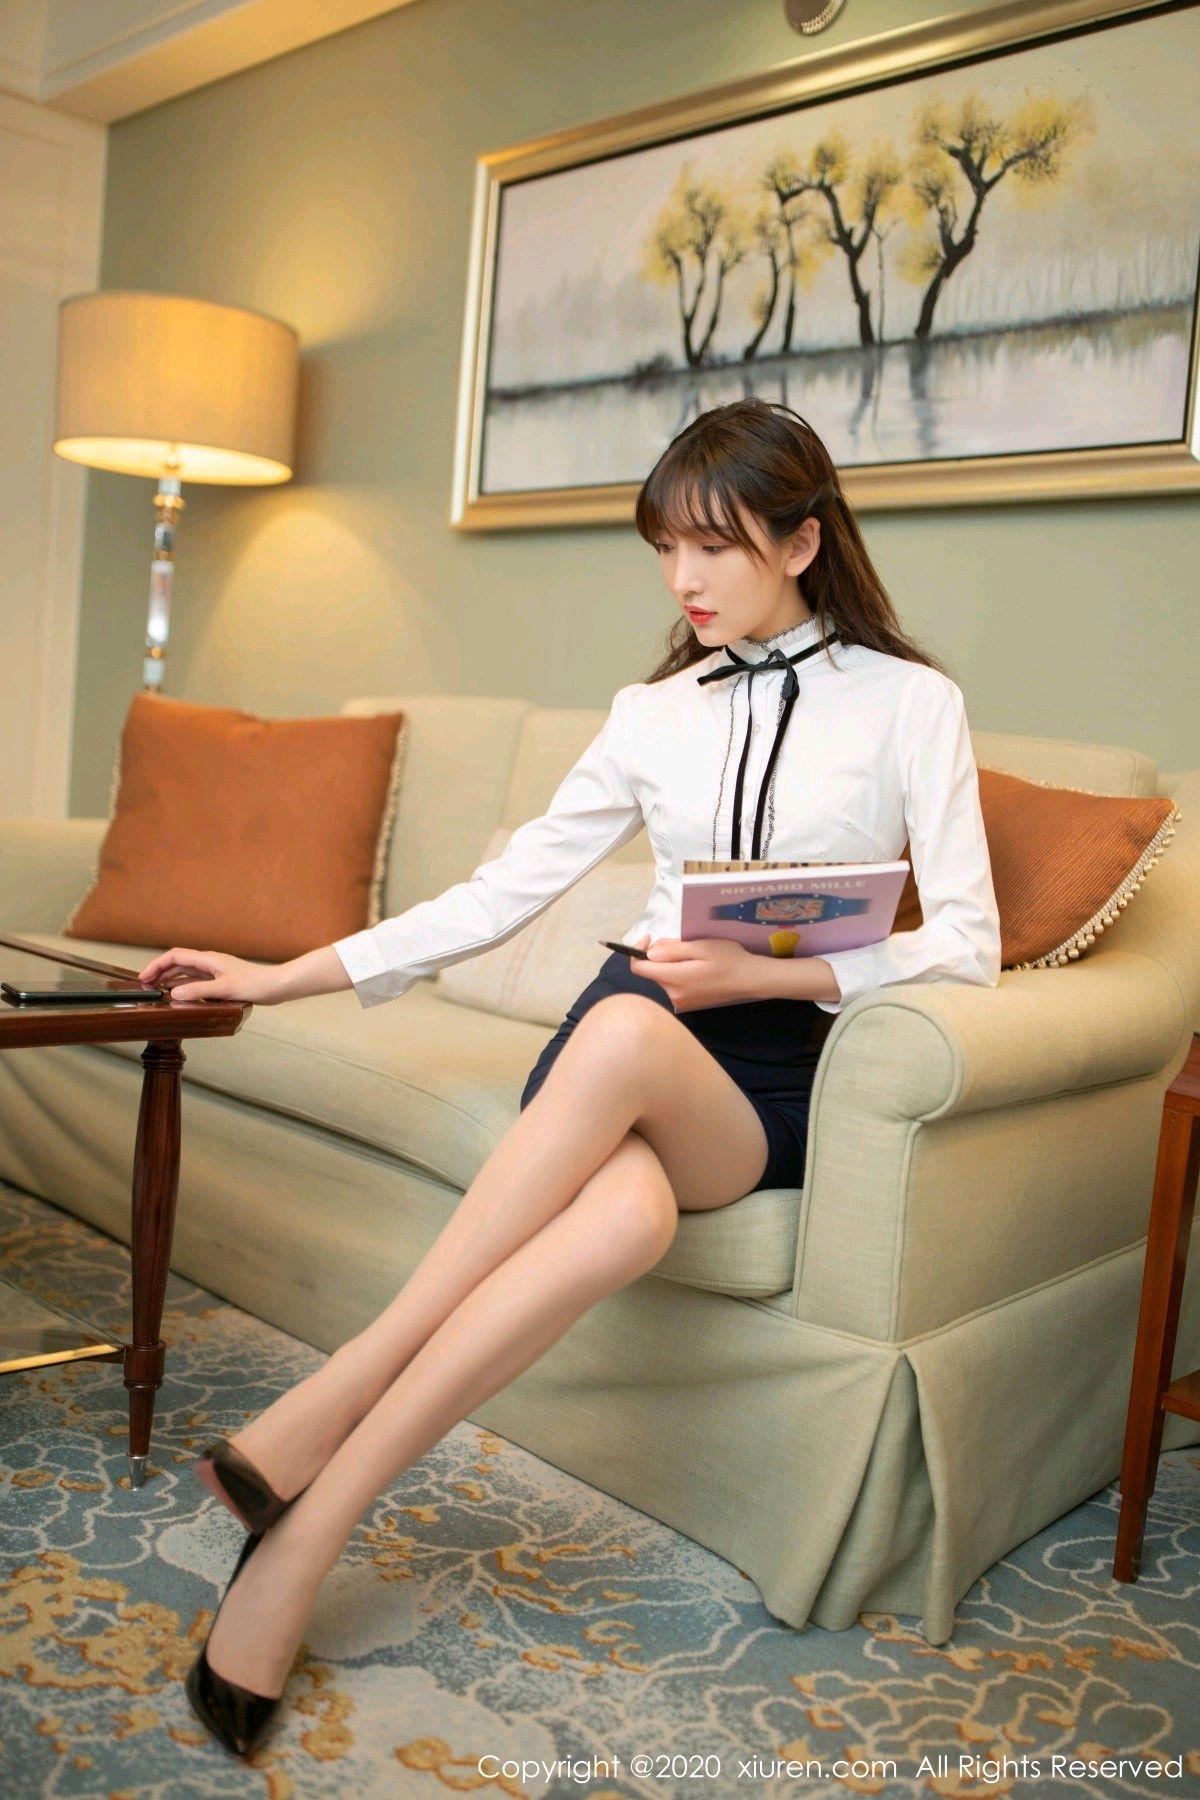 [XiuRen] Vol.2626 Secrets in mobile phones 6P, Chen Xiao Miao, Lu Xuan Xuan, School Uniform, Sisters, Xiuren